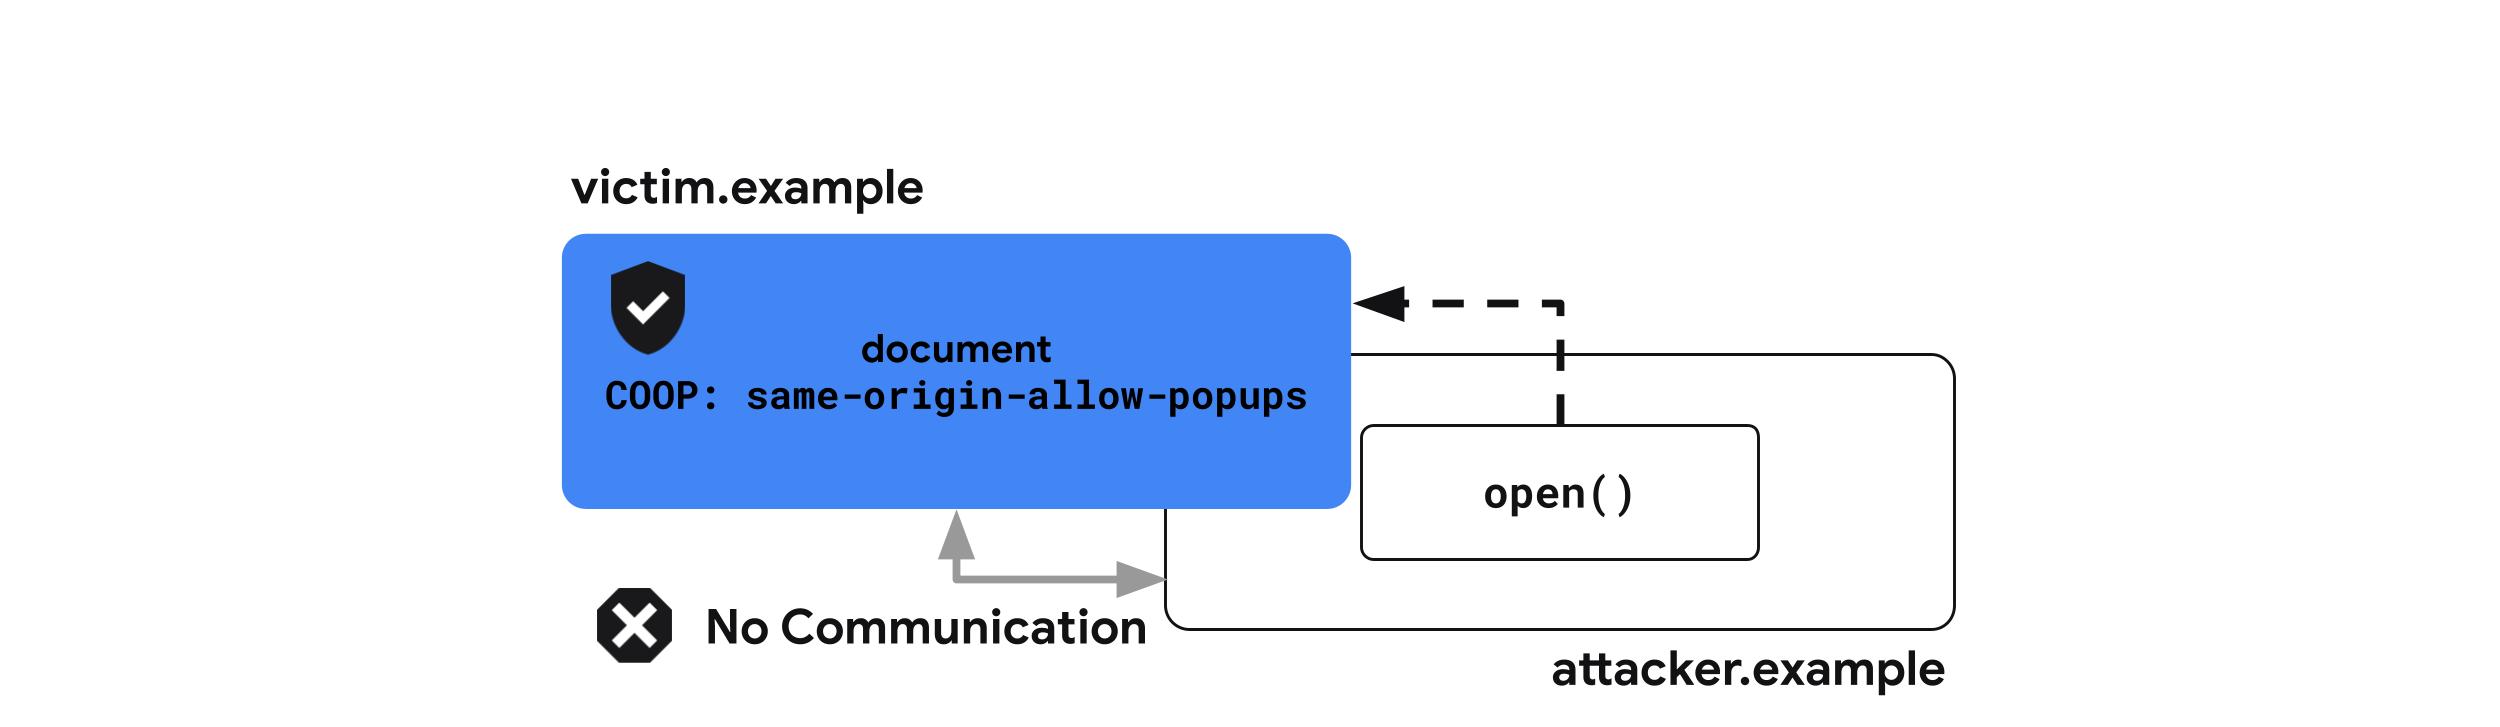 Cross-Origin-Opener-Policy: same-origin-allow-popups